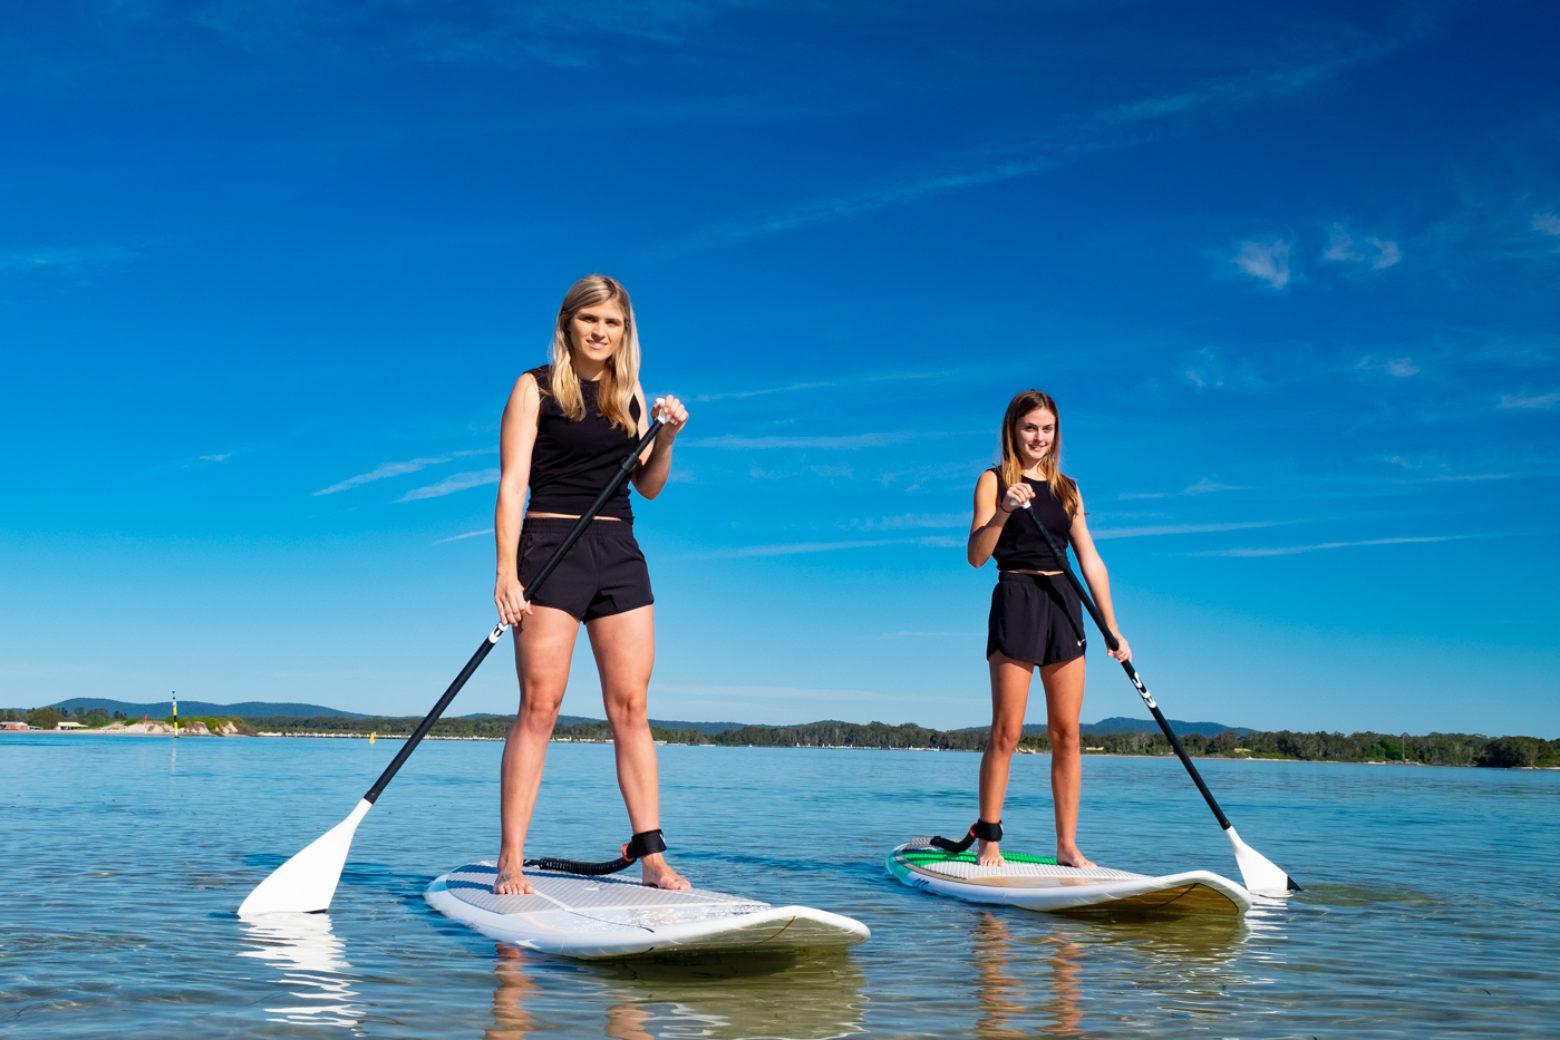 Stand up paddle boarding on Wallis Lake (photo by Jungle Surf)